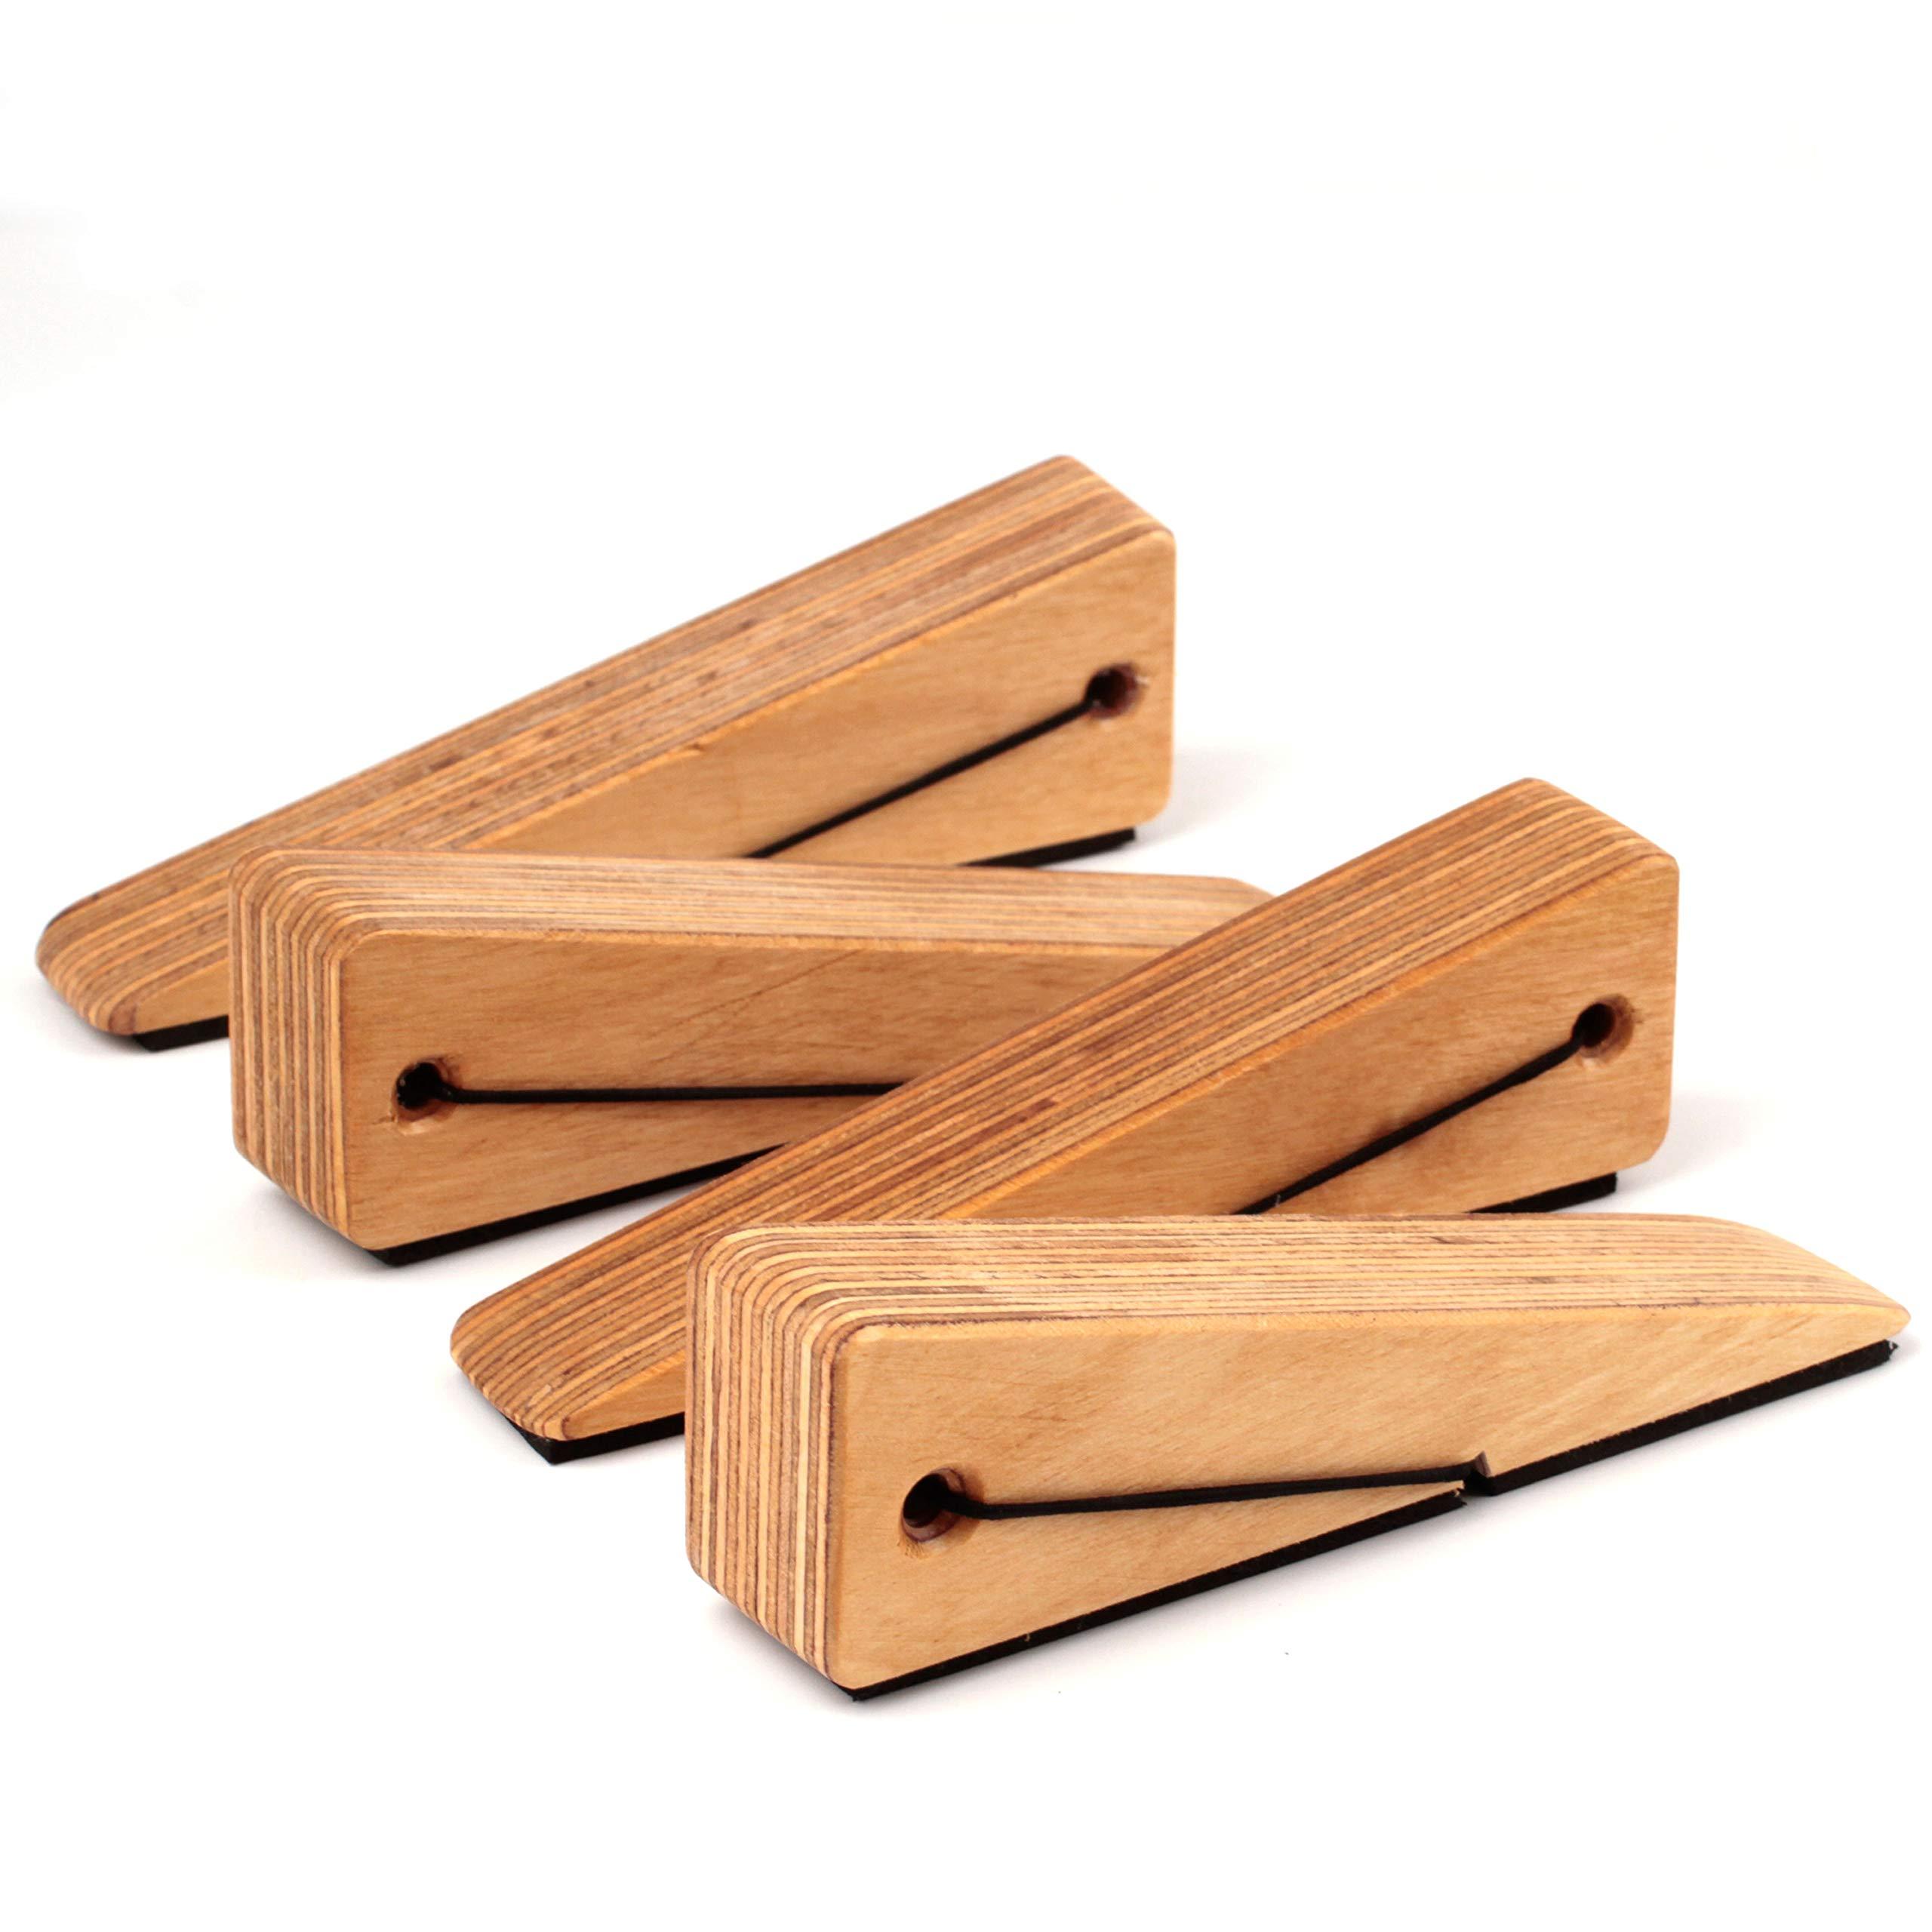 Multiple Sizes Extra Large Door Stops With Heavy Duty Door Stopper Decorative Wooden Doorstop Wedge Multiple Surface Wood Door Stop With Leather Band Quality Design For All Surfaces Door Stops